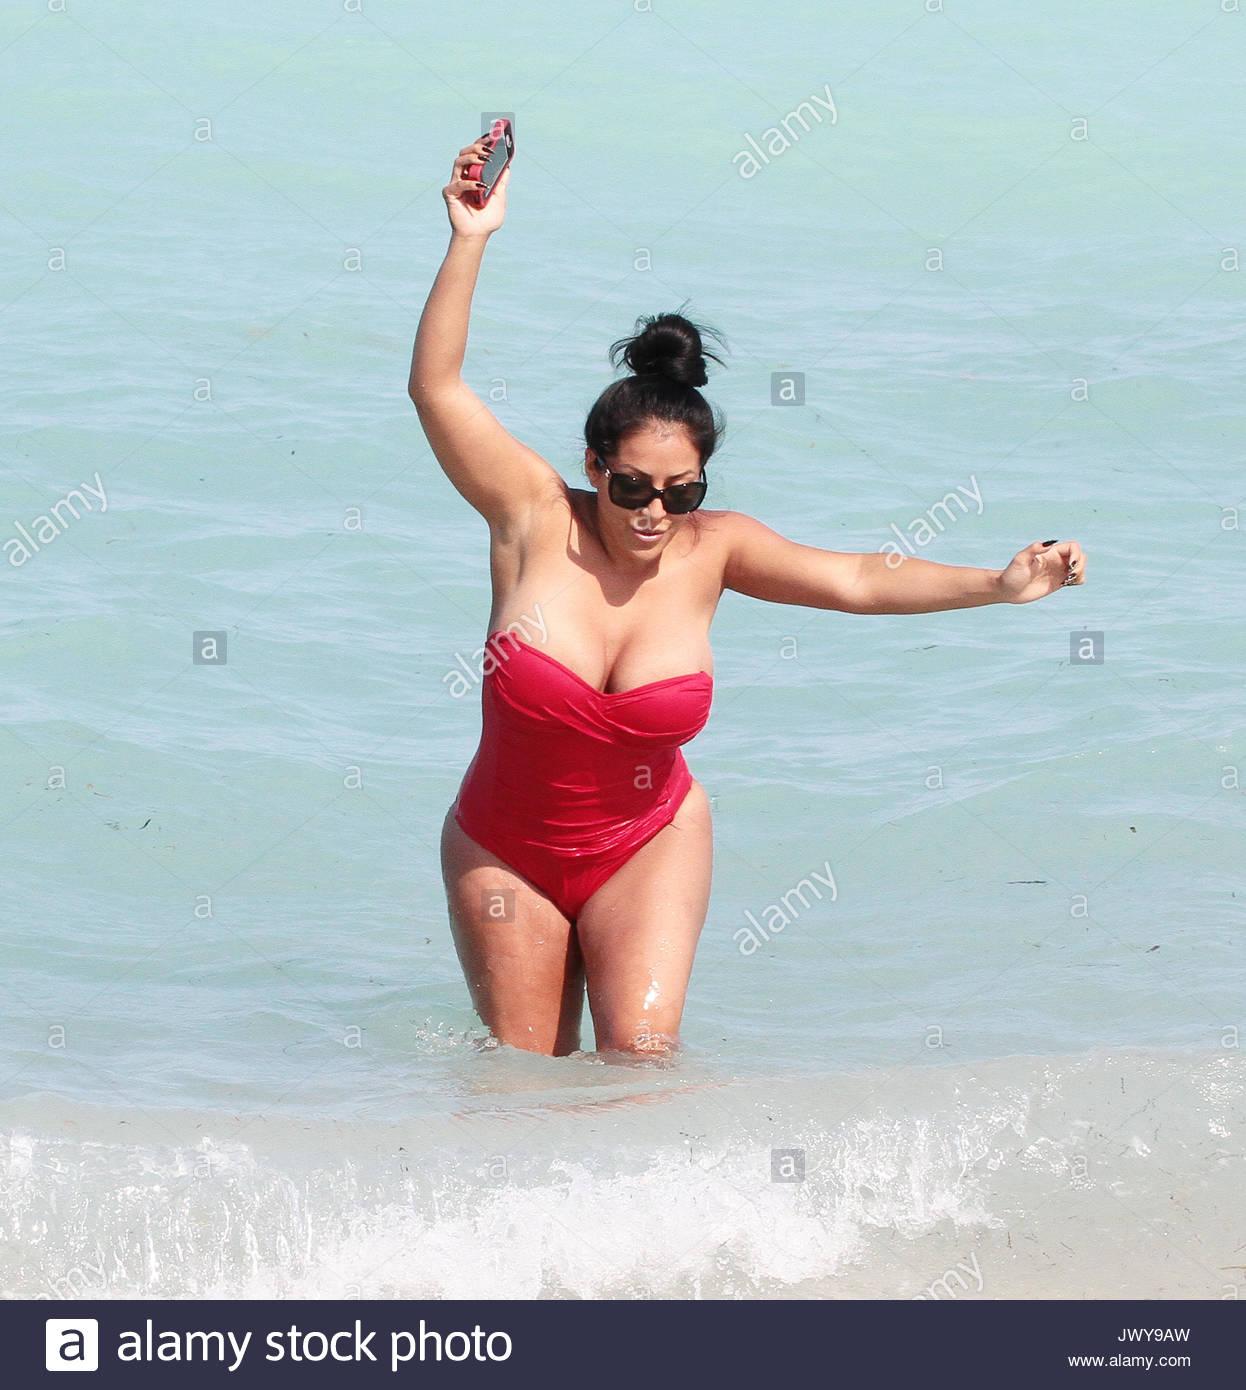 Kiara Mia nudes (68 foto and video), Topless, Hot, Feet, see through 2017